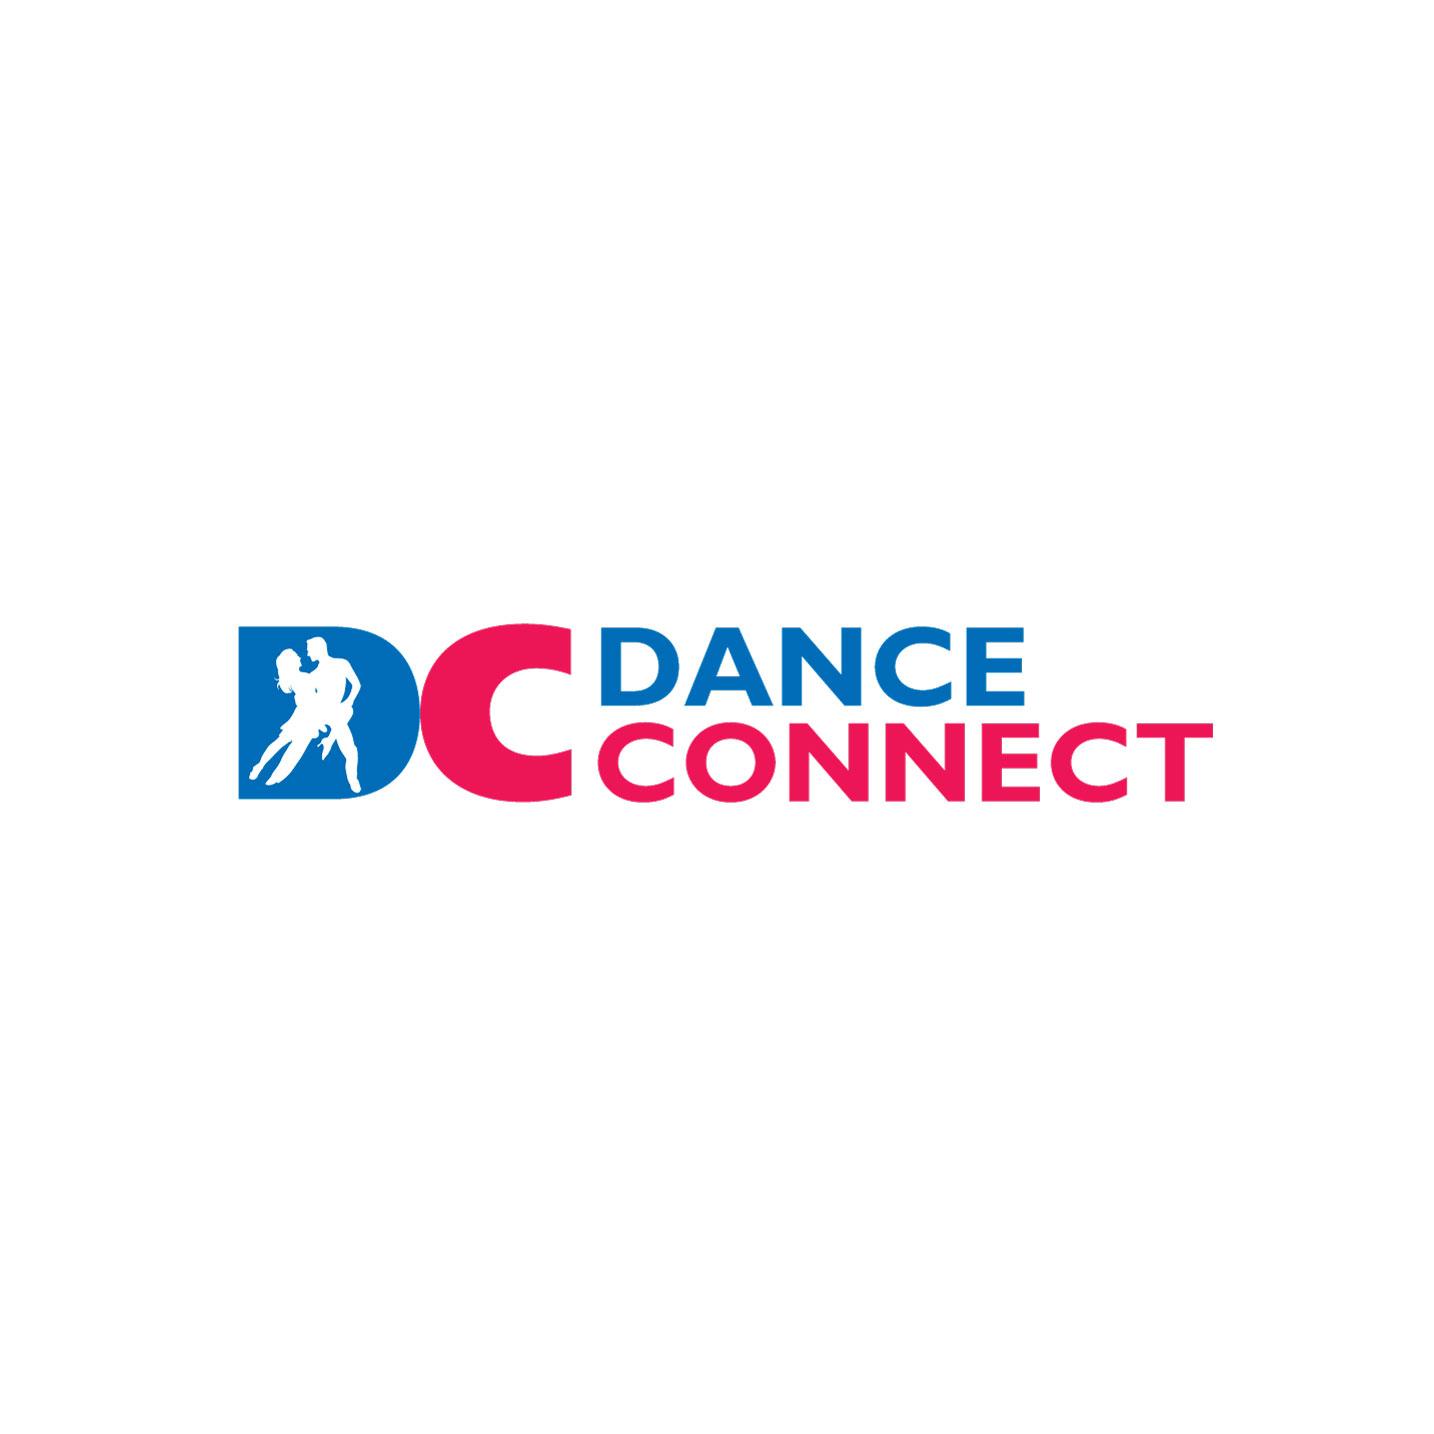 Разработка лого для спортивного портала www.danceconnect.ru фото f_7485b3f2205f23e4.jpg